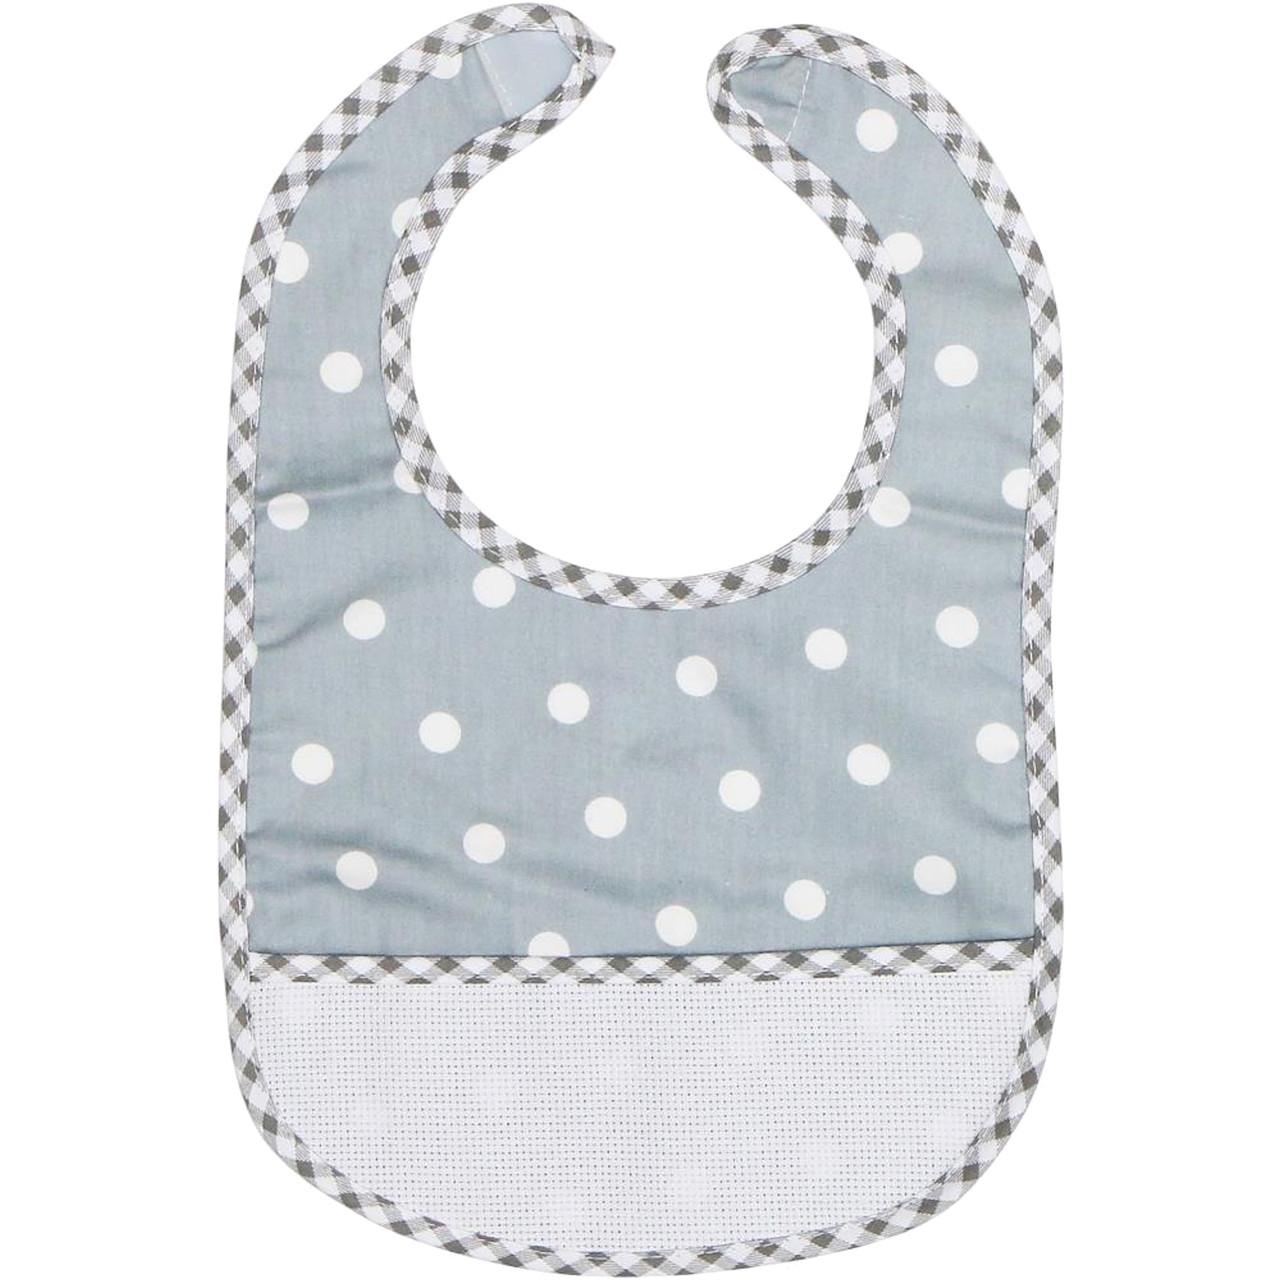 DMC Stitchable 14 count Grey Polka Dots Baby Bib